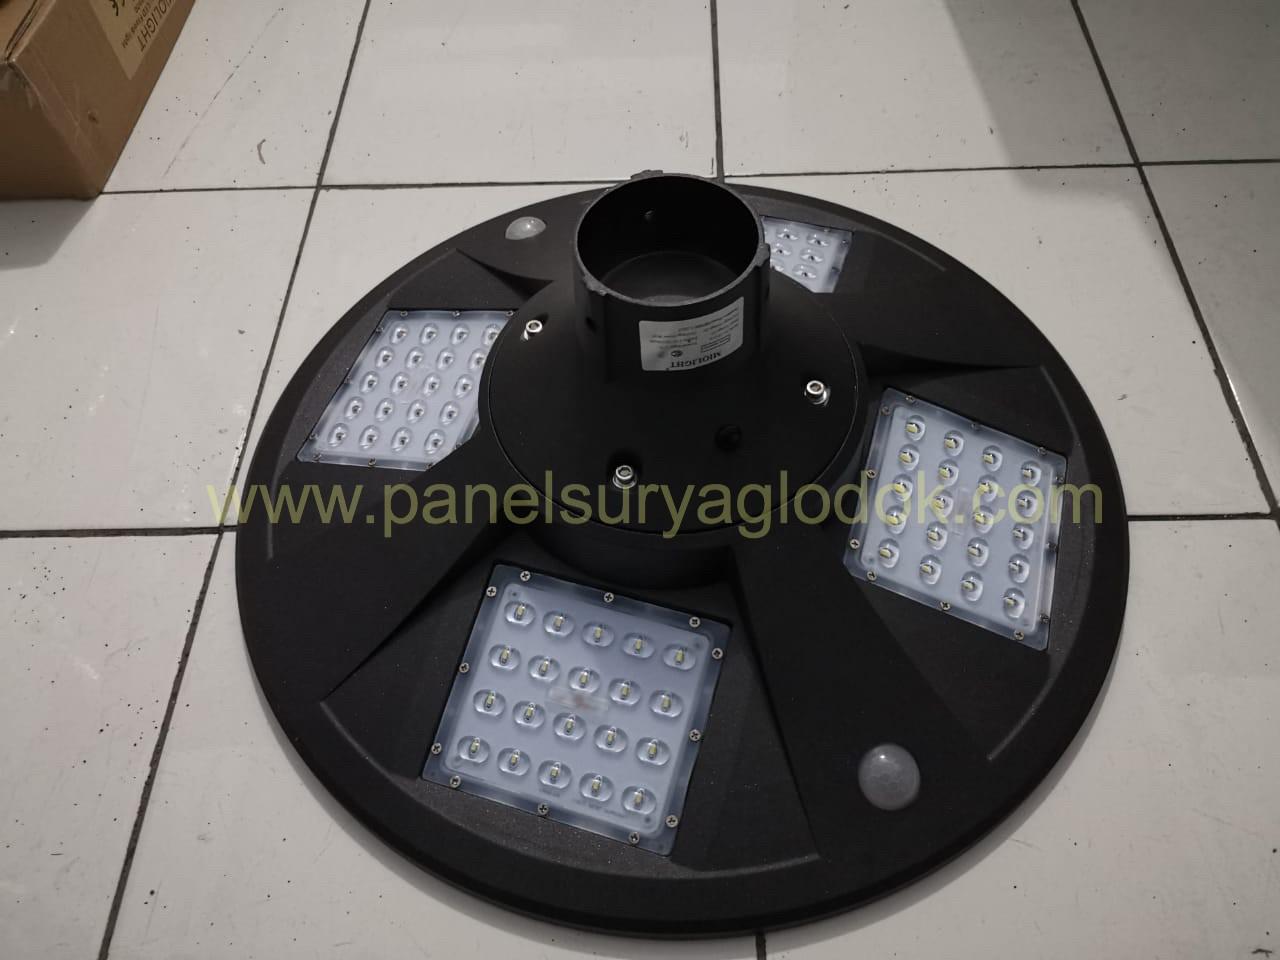 Lampu Taman Bulat Solar Panel 85w Merek Miolight Panel Surya Glodok Jual Solar Panel Gedung Ltc Glodok Lt Ug Blok C30 1 Jakarta 11180